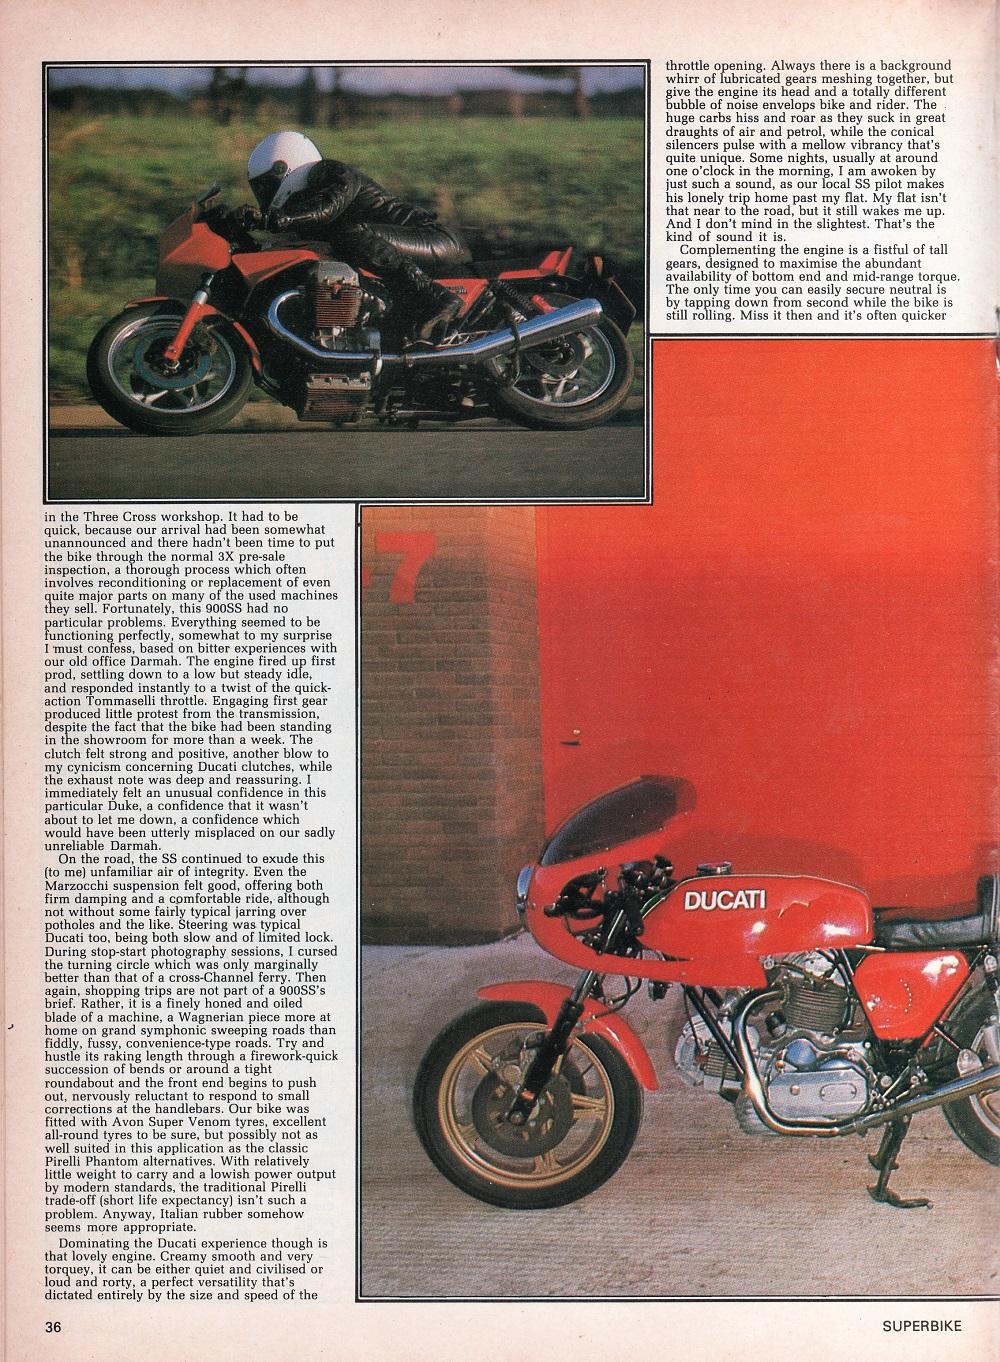 1979 Ducati 900SS & 1981 Moto Guzzi Le Mans 111 road test.3.jpg